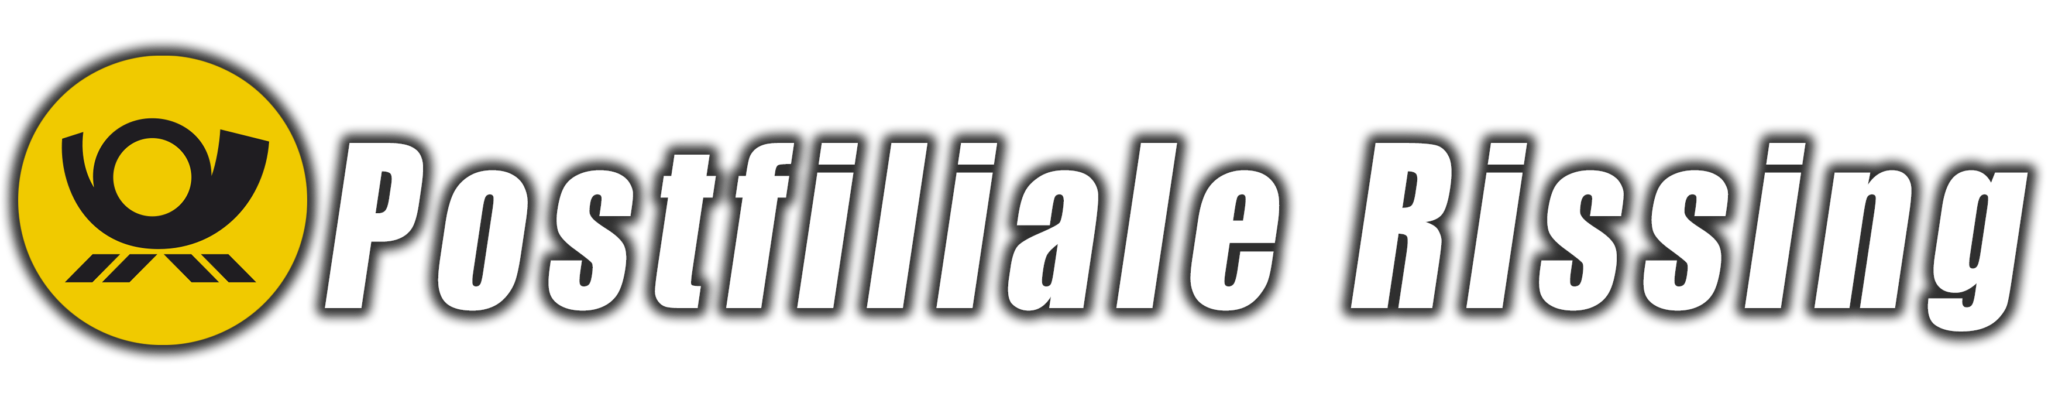 Postfiliale Rissing Brakel